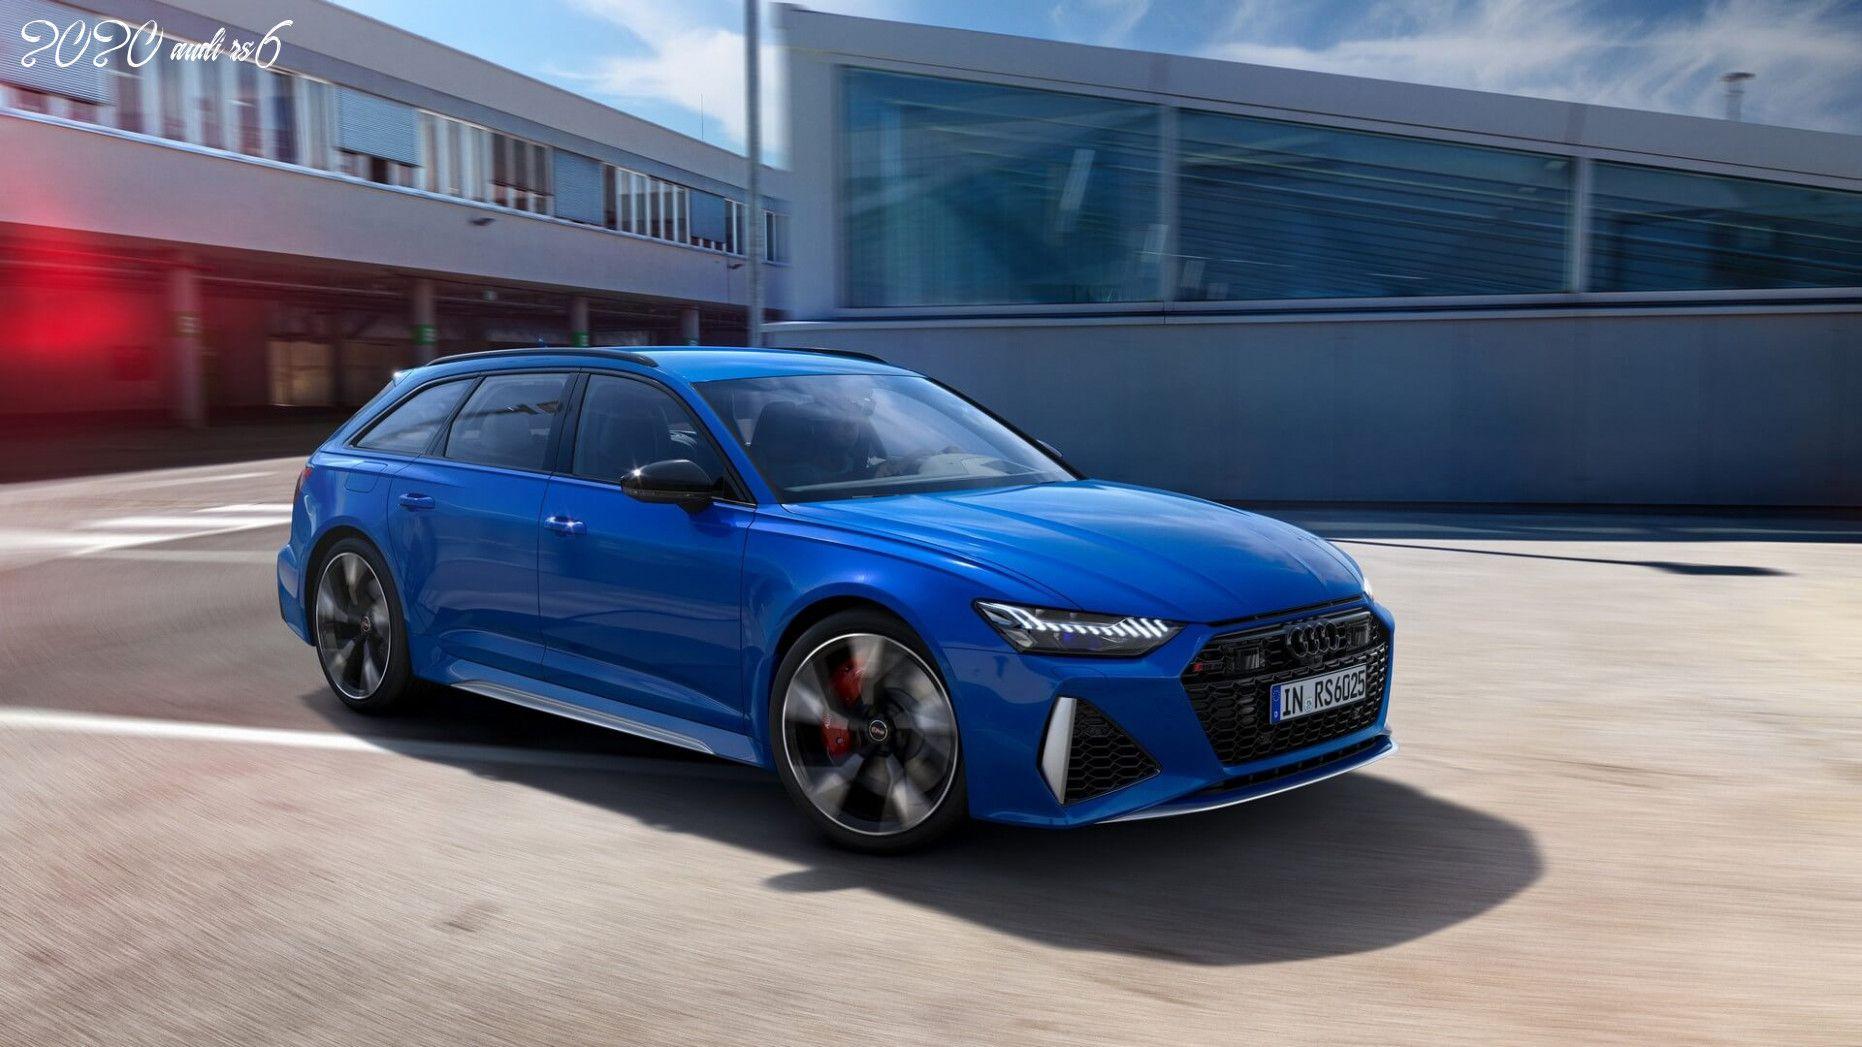 2020 Audi Rs6 In 2020 Audi Rs6 Audi Rs Audi Wagon